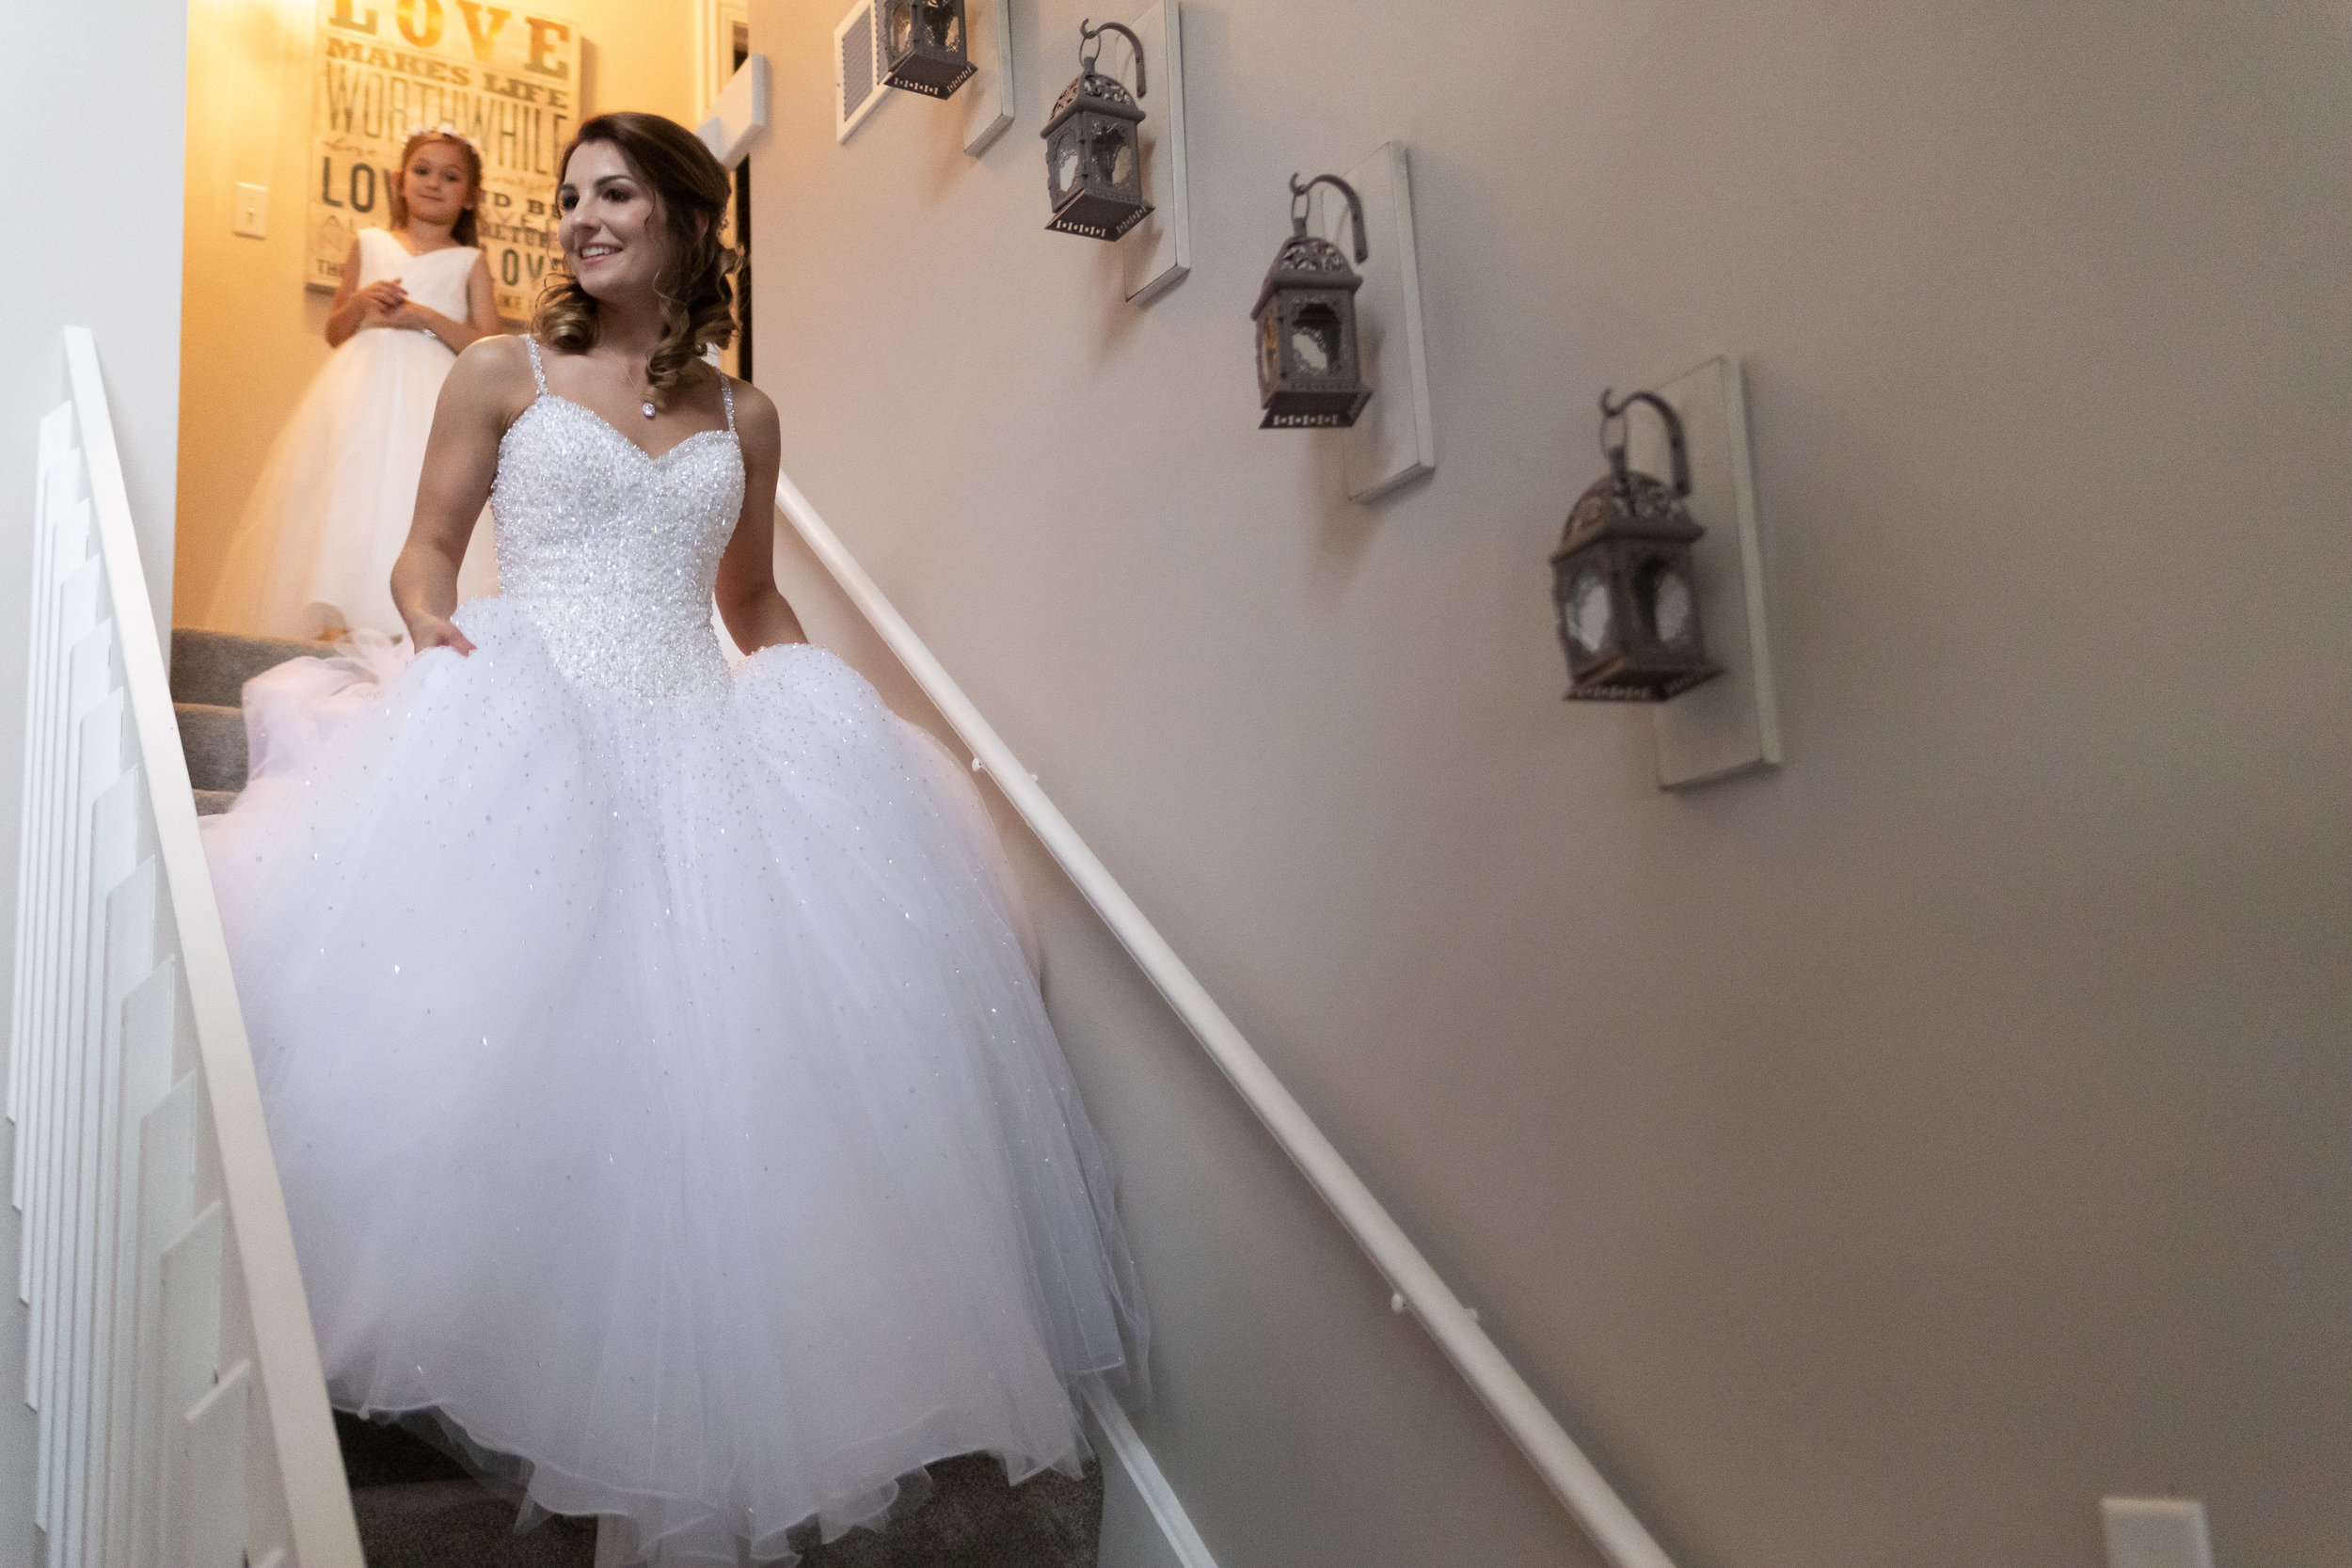 Wedding-couple-takes-photos-at-lowes-hardware-due-to-rain35.jpg